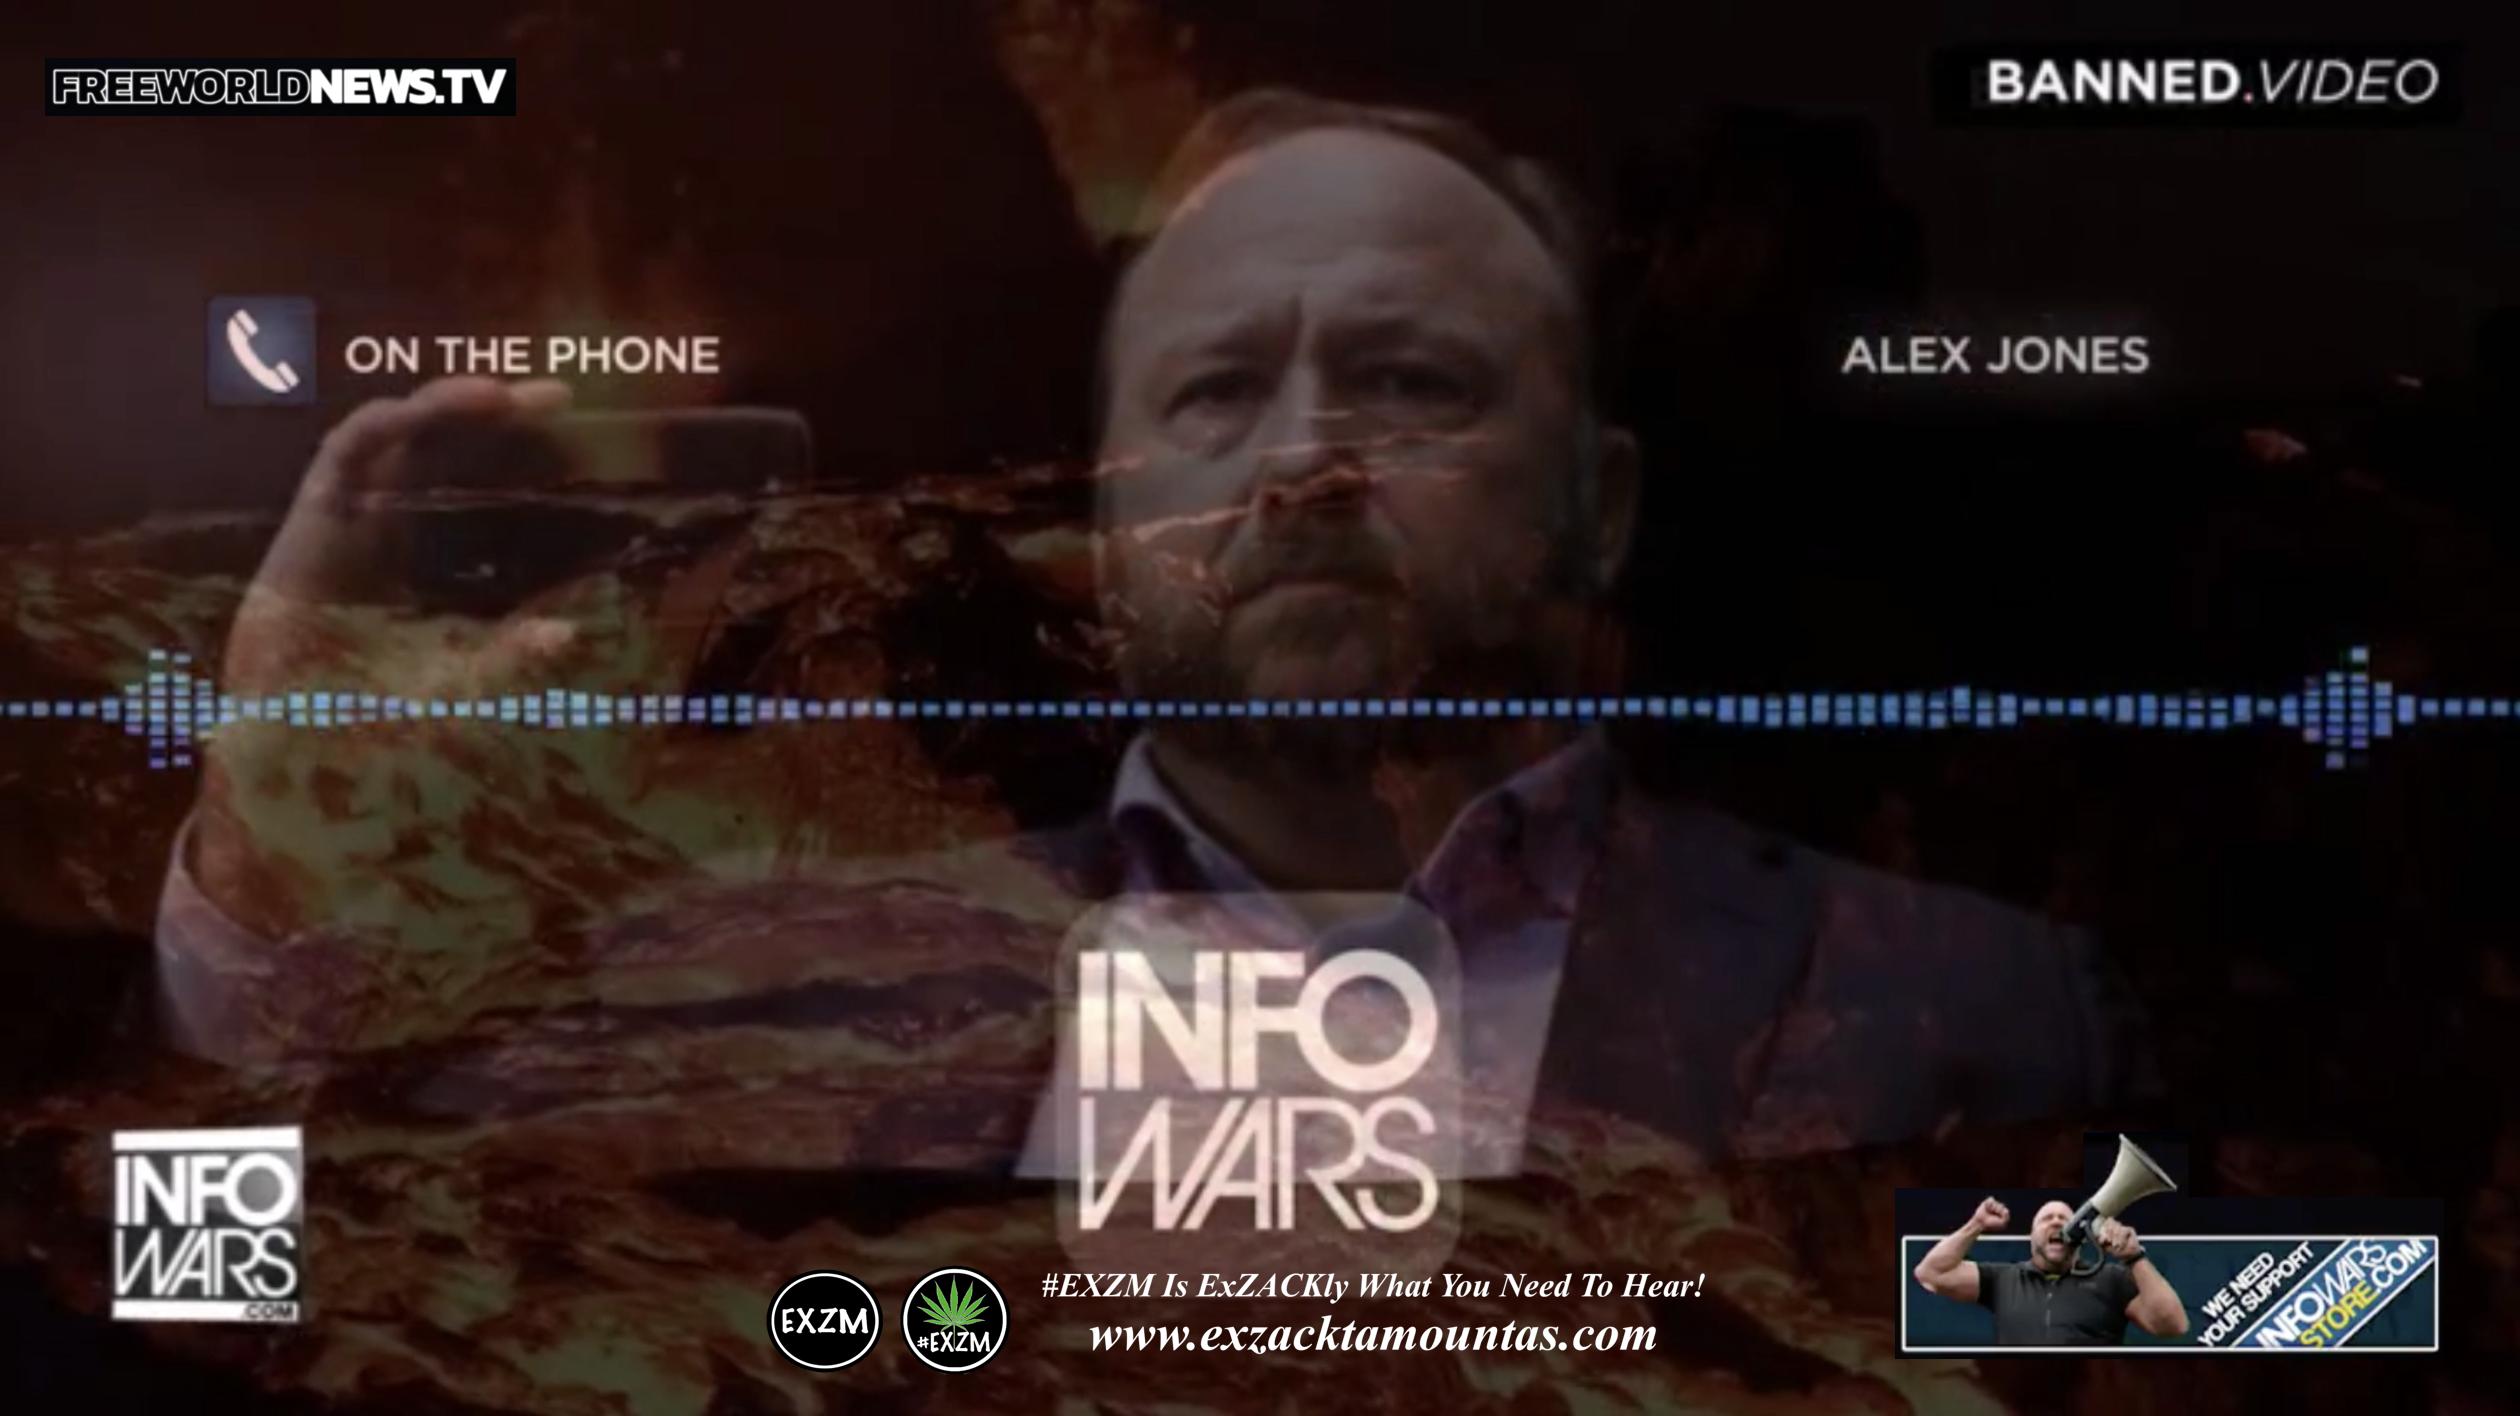 Alex Jones Live In Infowars Studio Free World News TV EXZM Zack Mount September 12th 2021